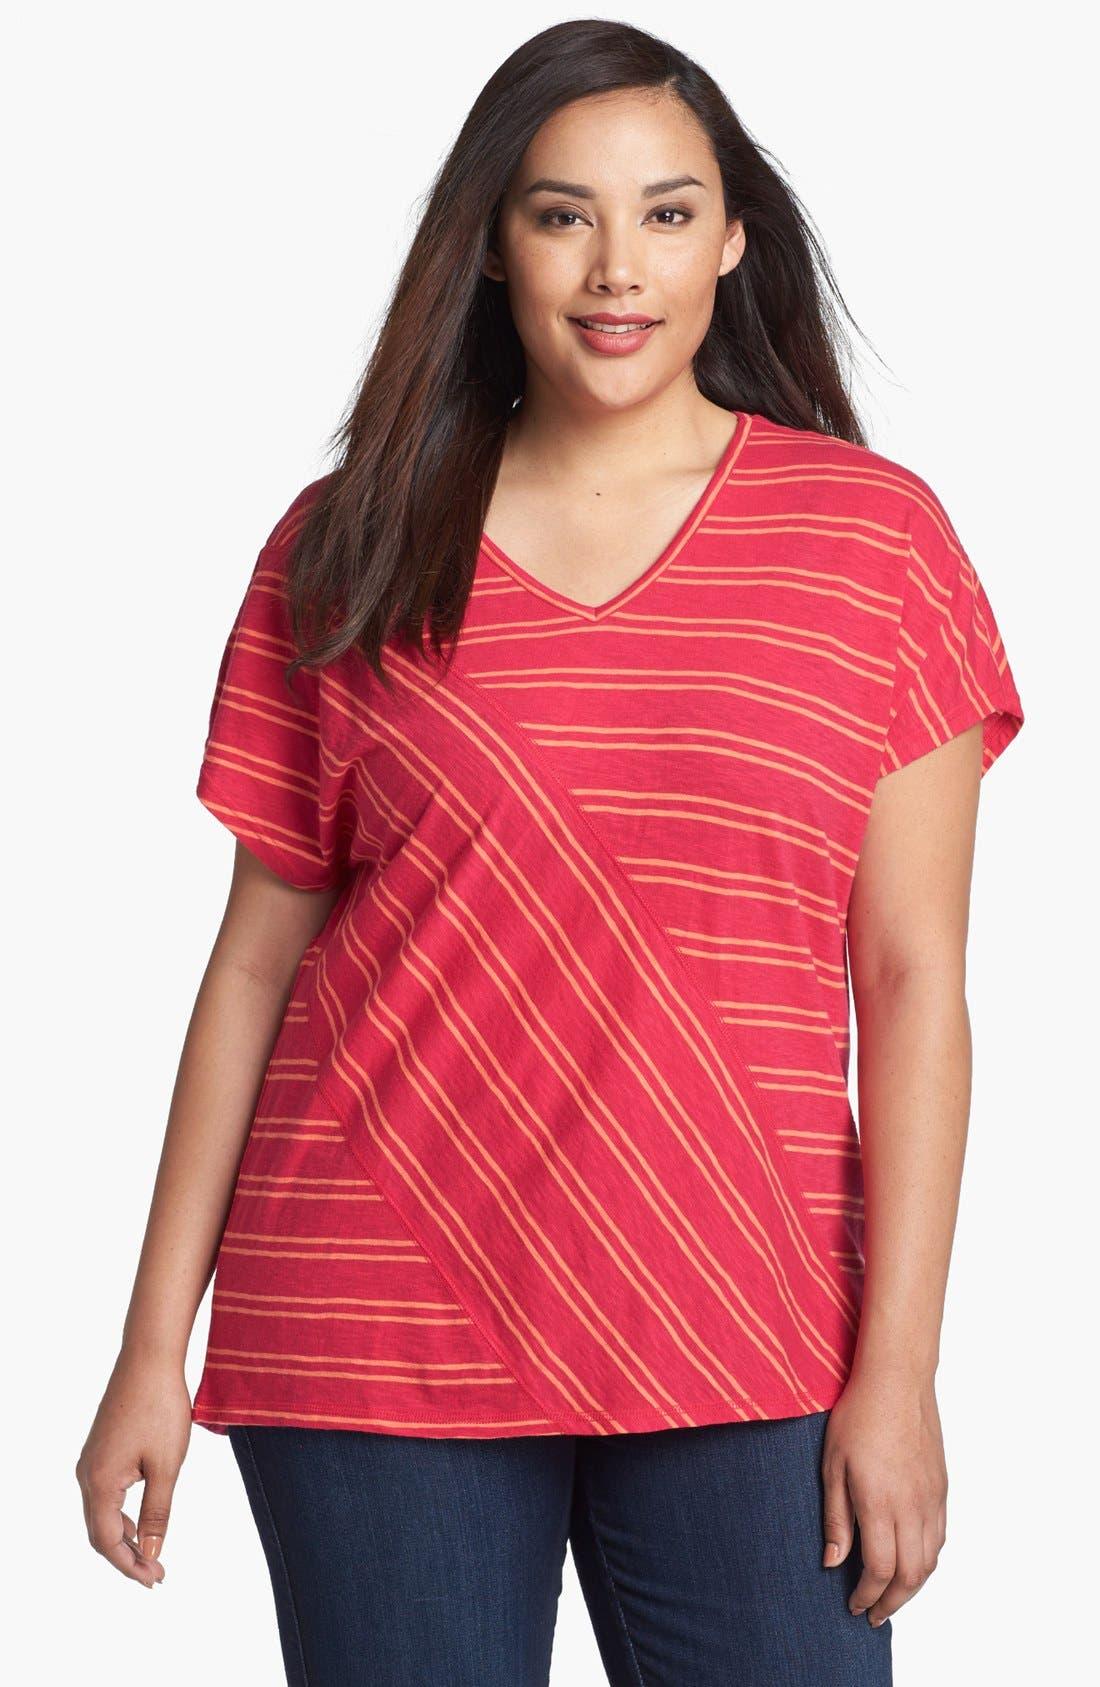 Alternate Image 1 Selected - Sejour Stripe Slubbed Tee (Plus Size)